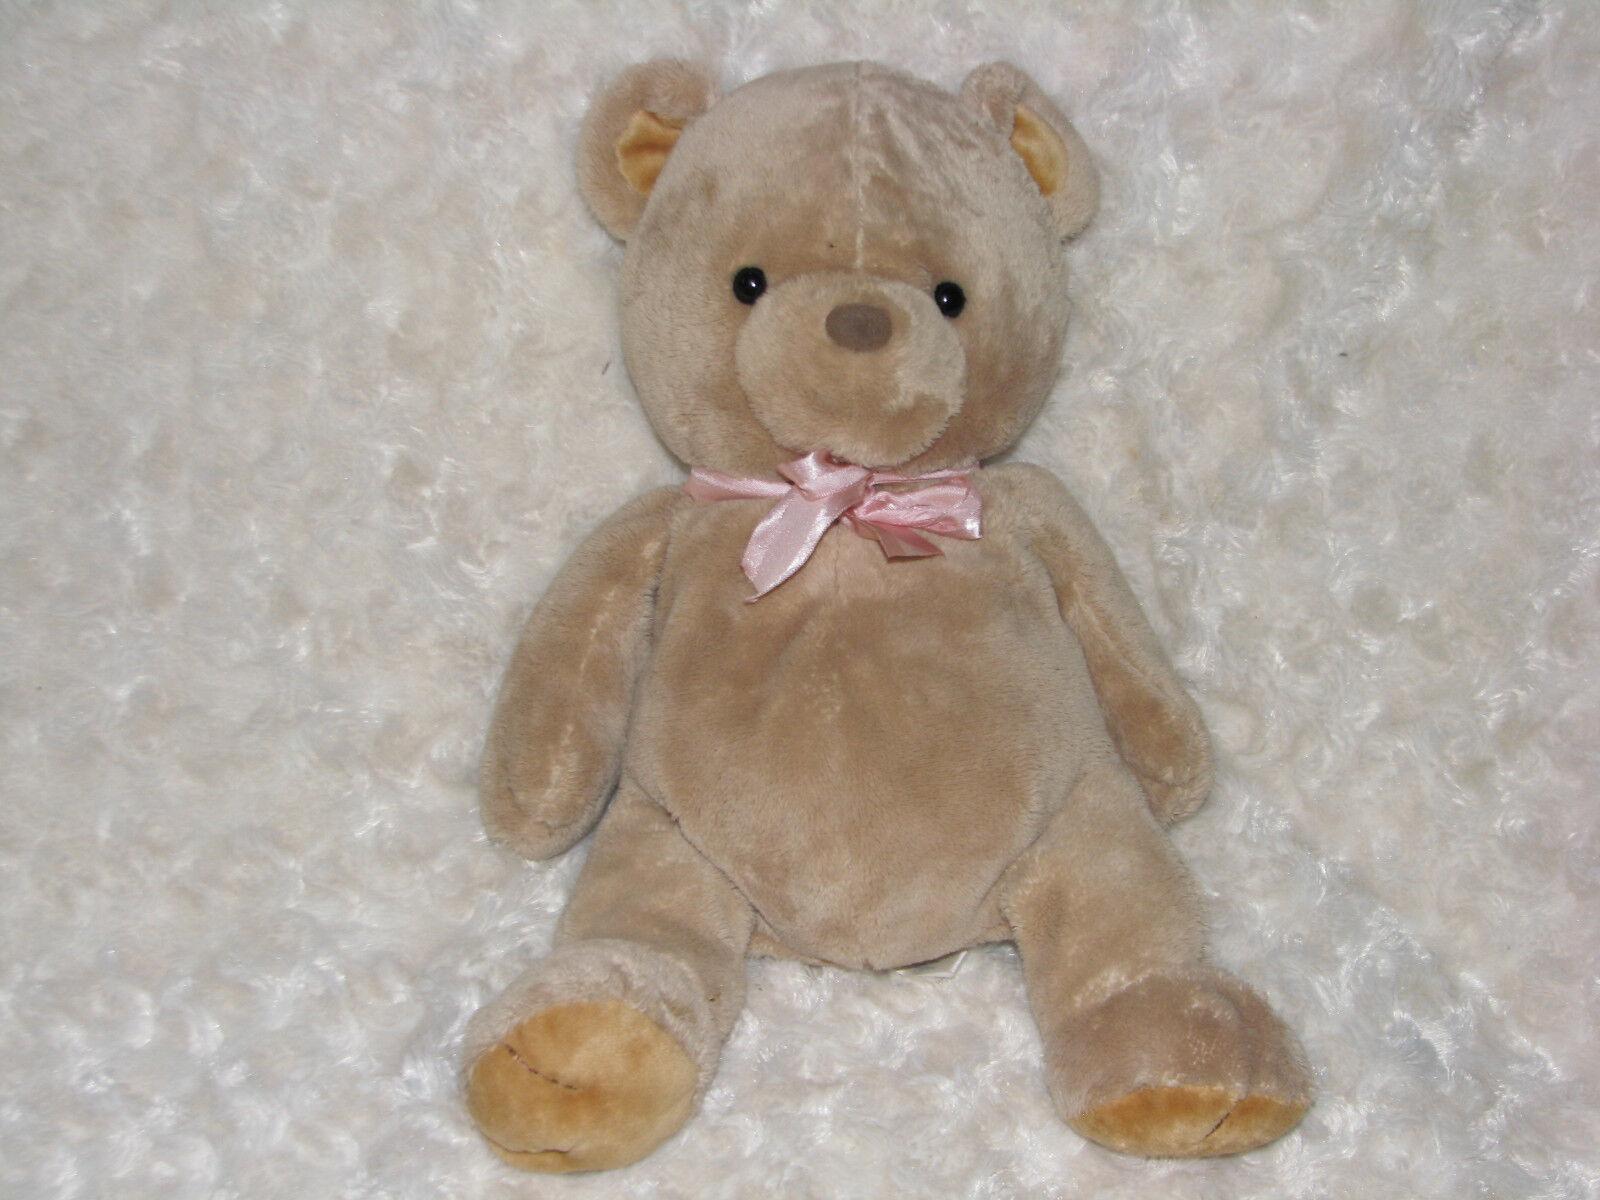 PRESTIGE STUFFED PLUSH TEDDY BEAR BROWN TAN PINK RIBBON BOW BEANS GIRL BABY 12